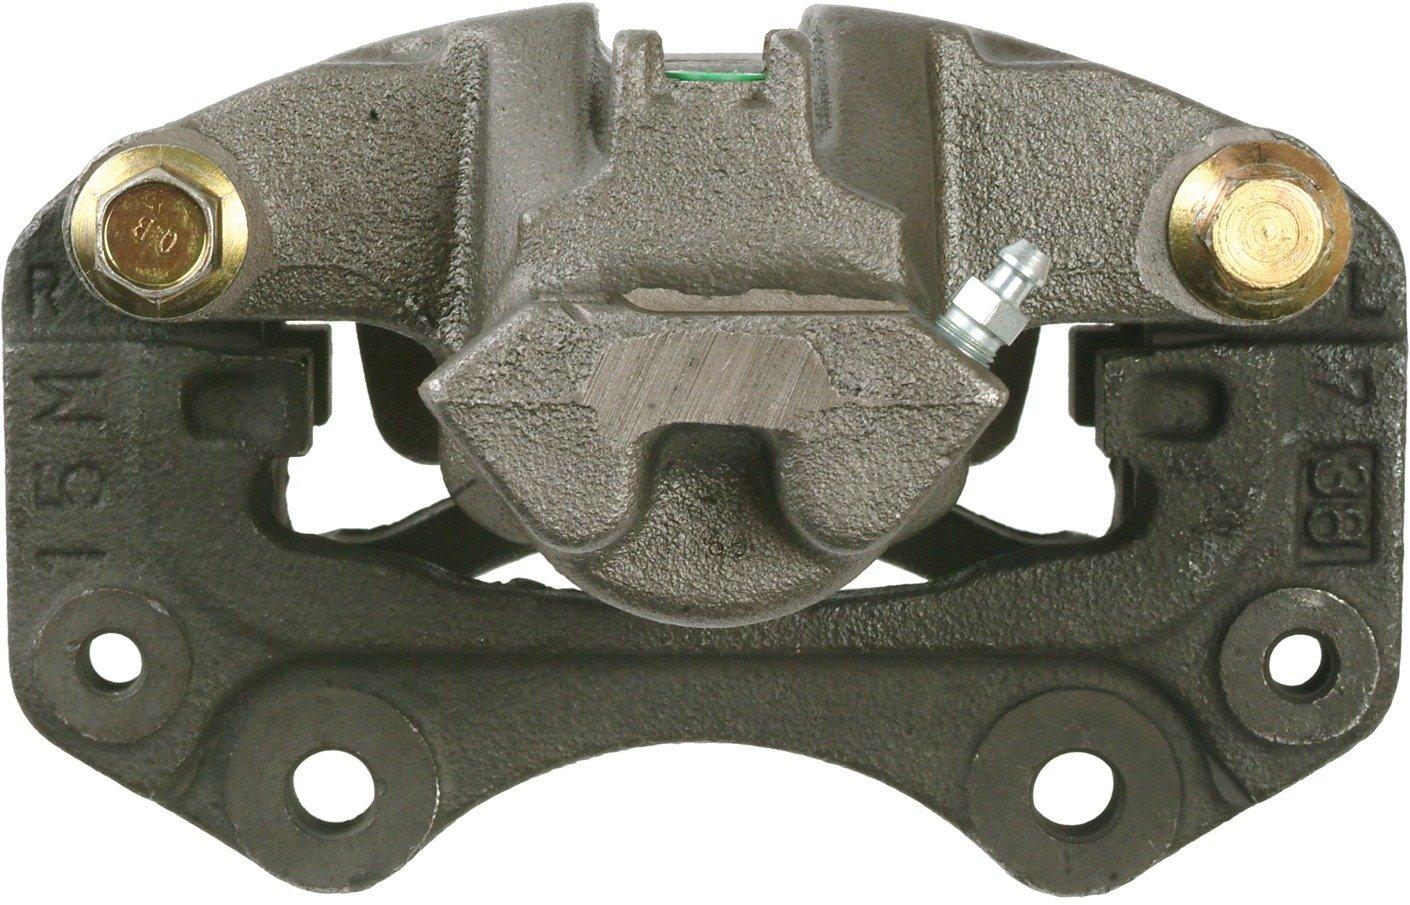 Cardone 18-B8031 Remanufactured Domestic Friction Ready (Unloaded) Brake Caliper